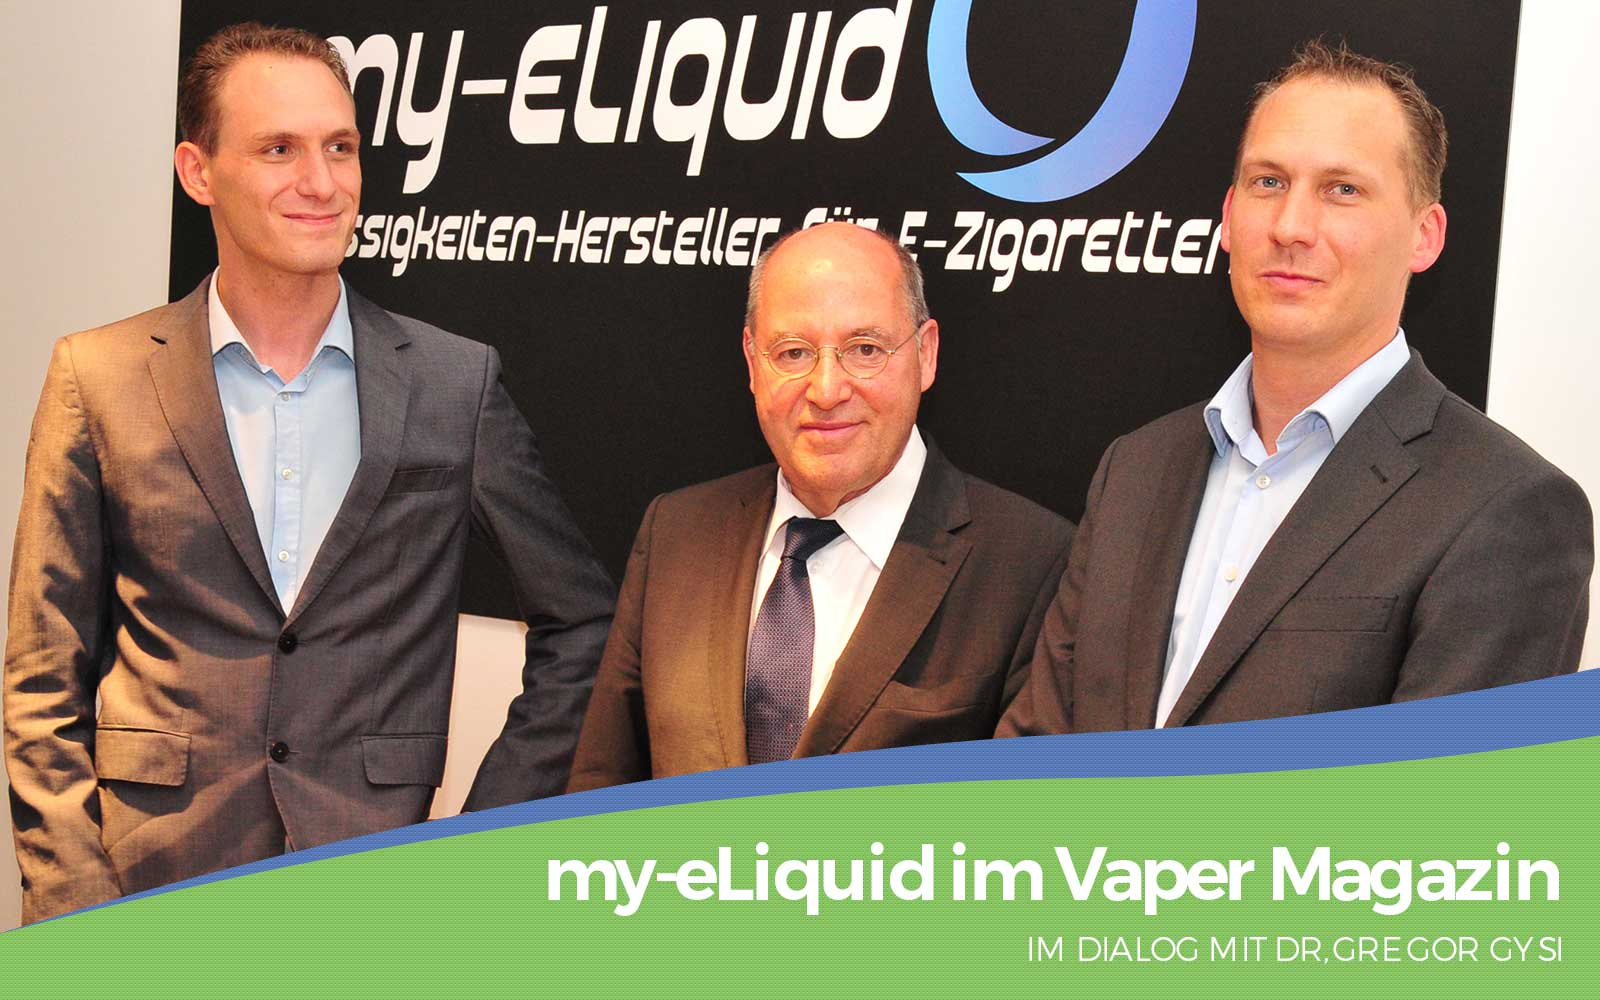 my-eLiquid | Dr.Gregor Gysi | Politik Dialog | Vaper Magazin